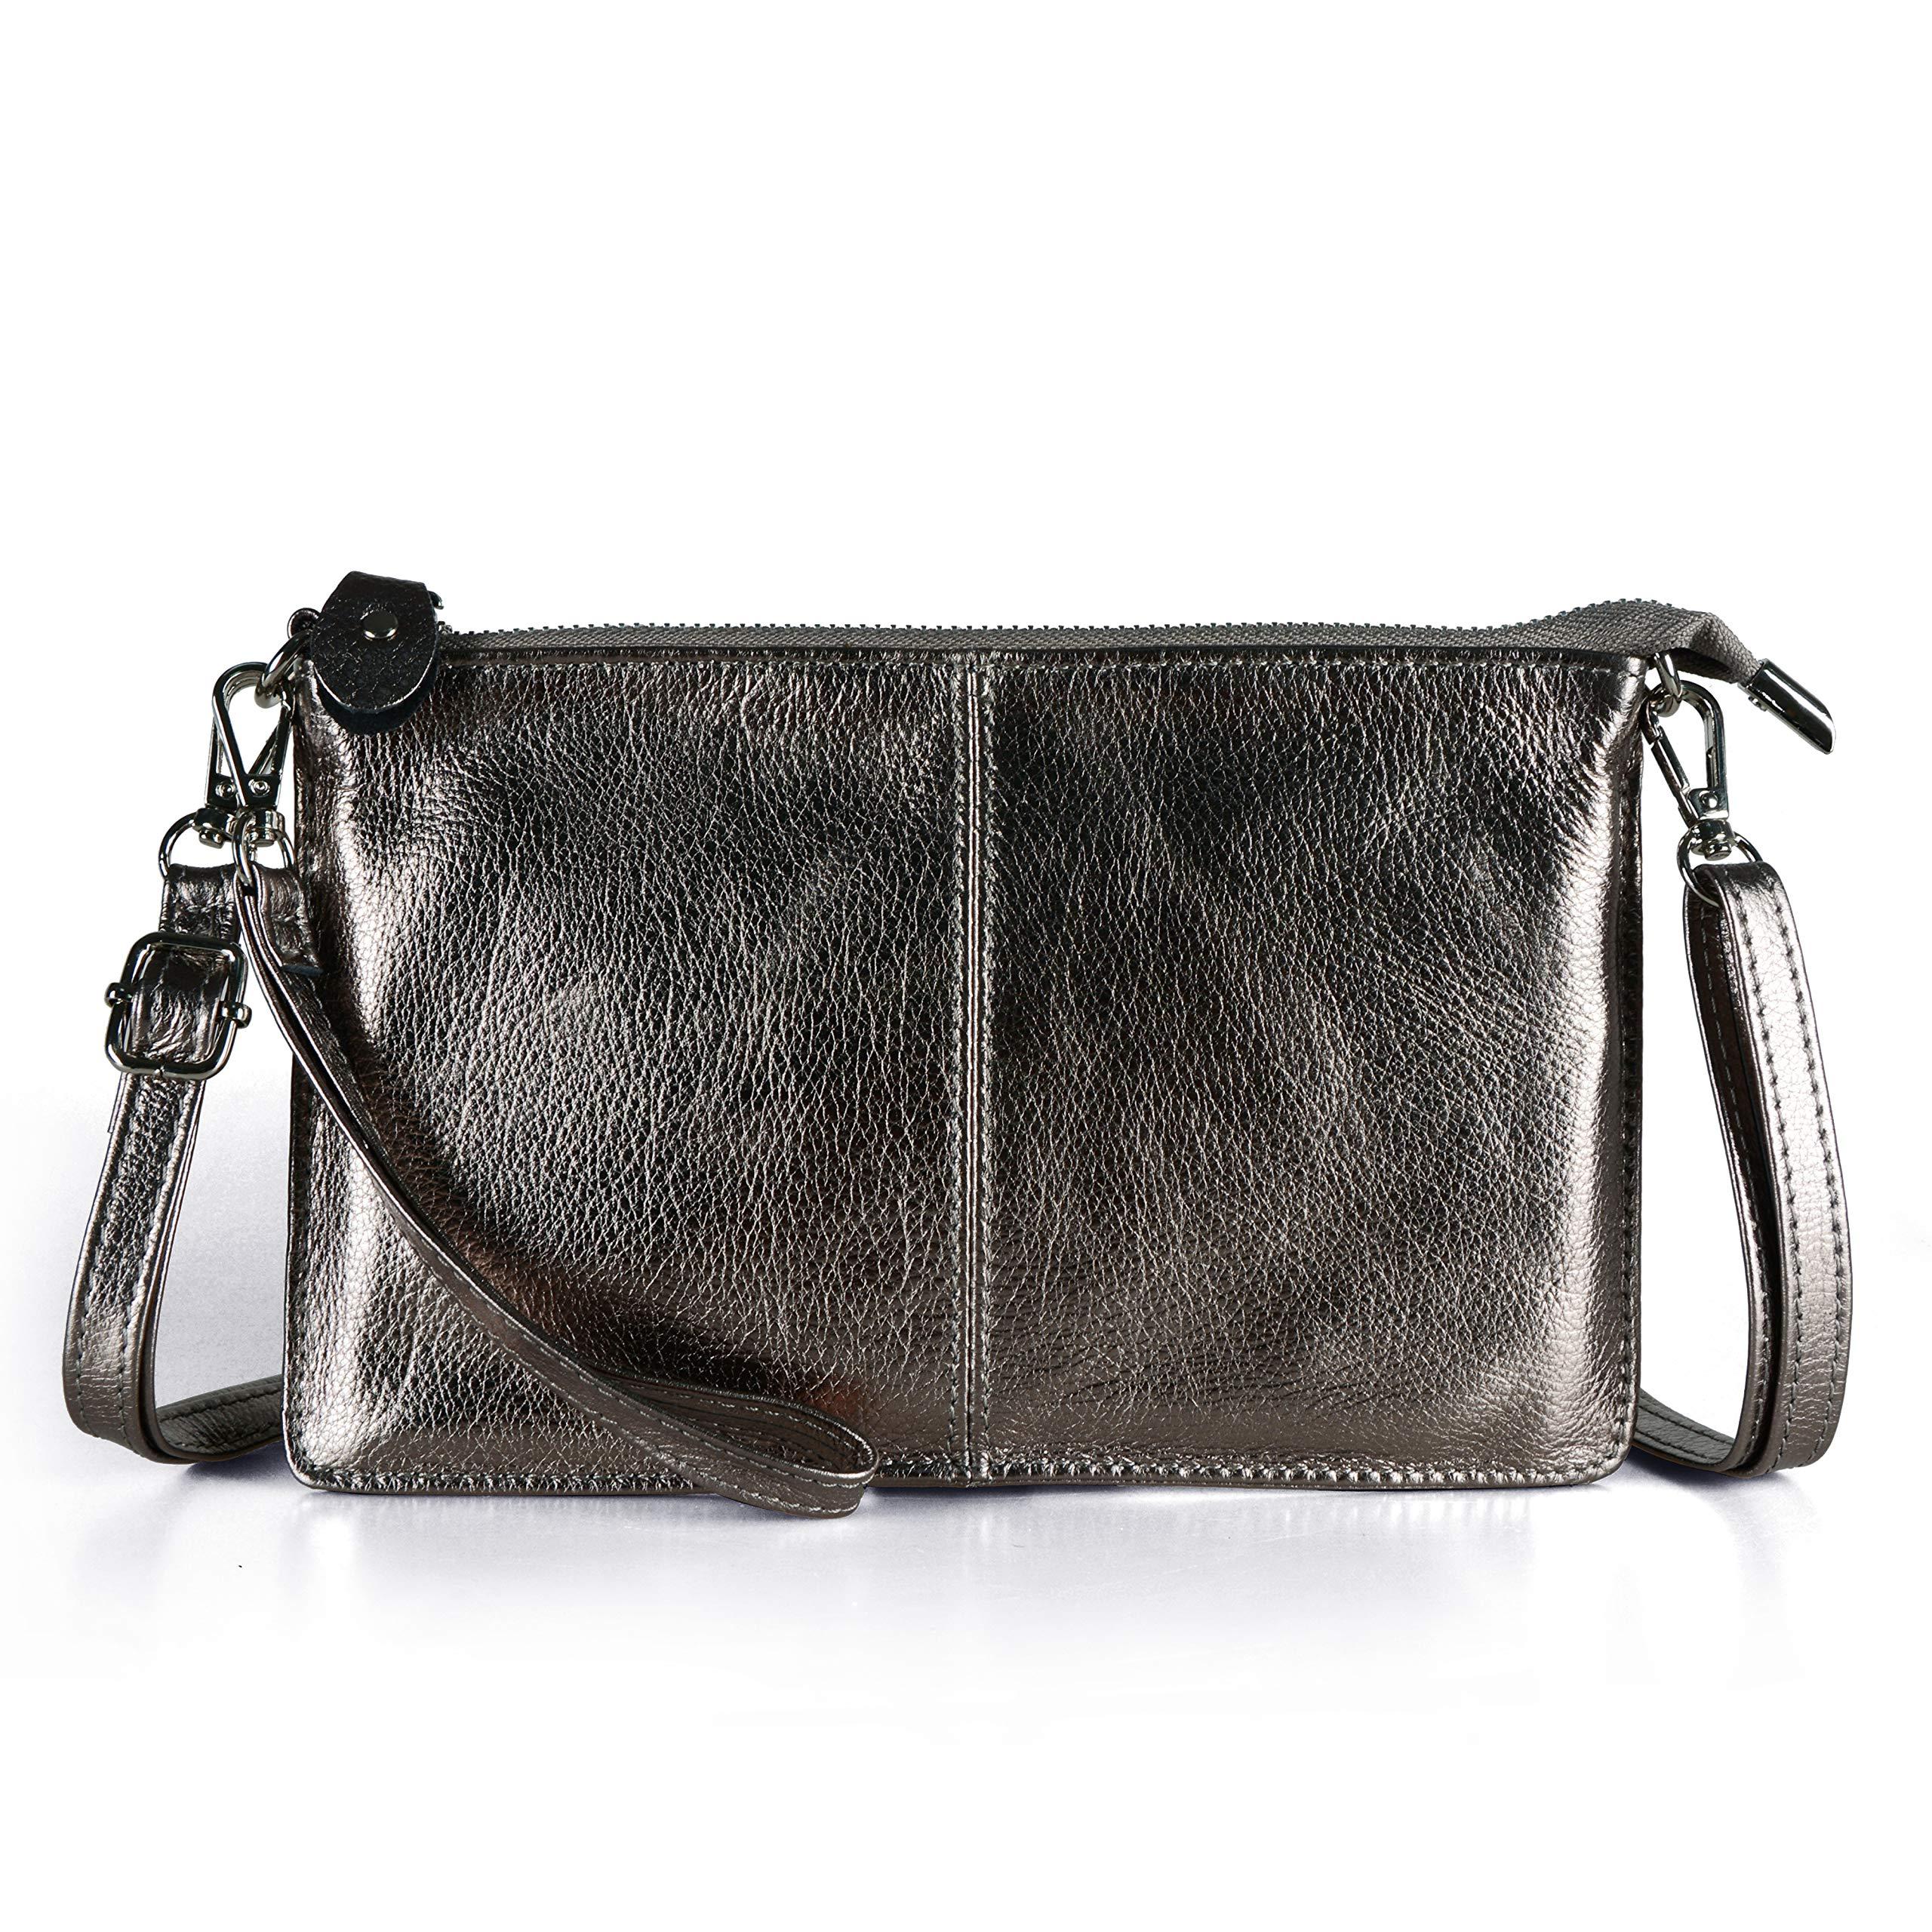 Befen Women Leather Wristlet Wallet Shoulder Crossbody Bag Clutch Purses with 6 Card Slots/Wrist Strap/Crossbody Strap - Gunmetal Grey